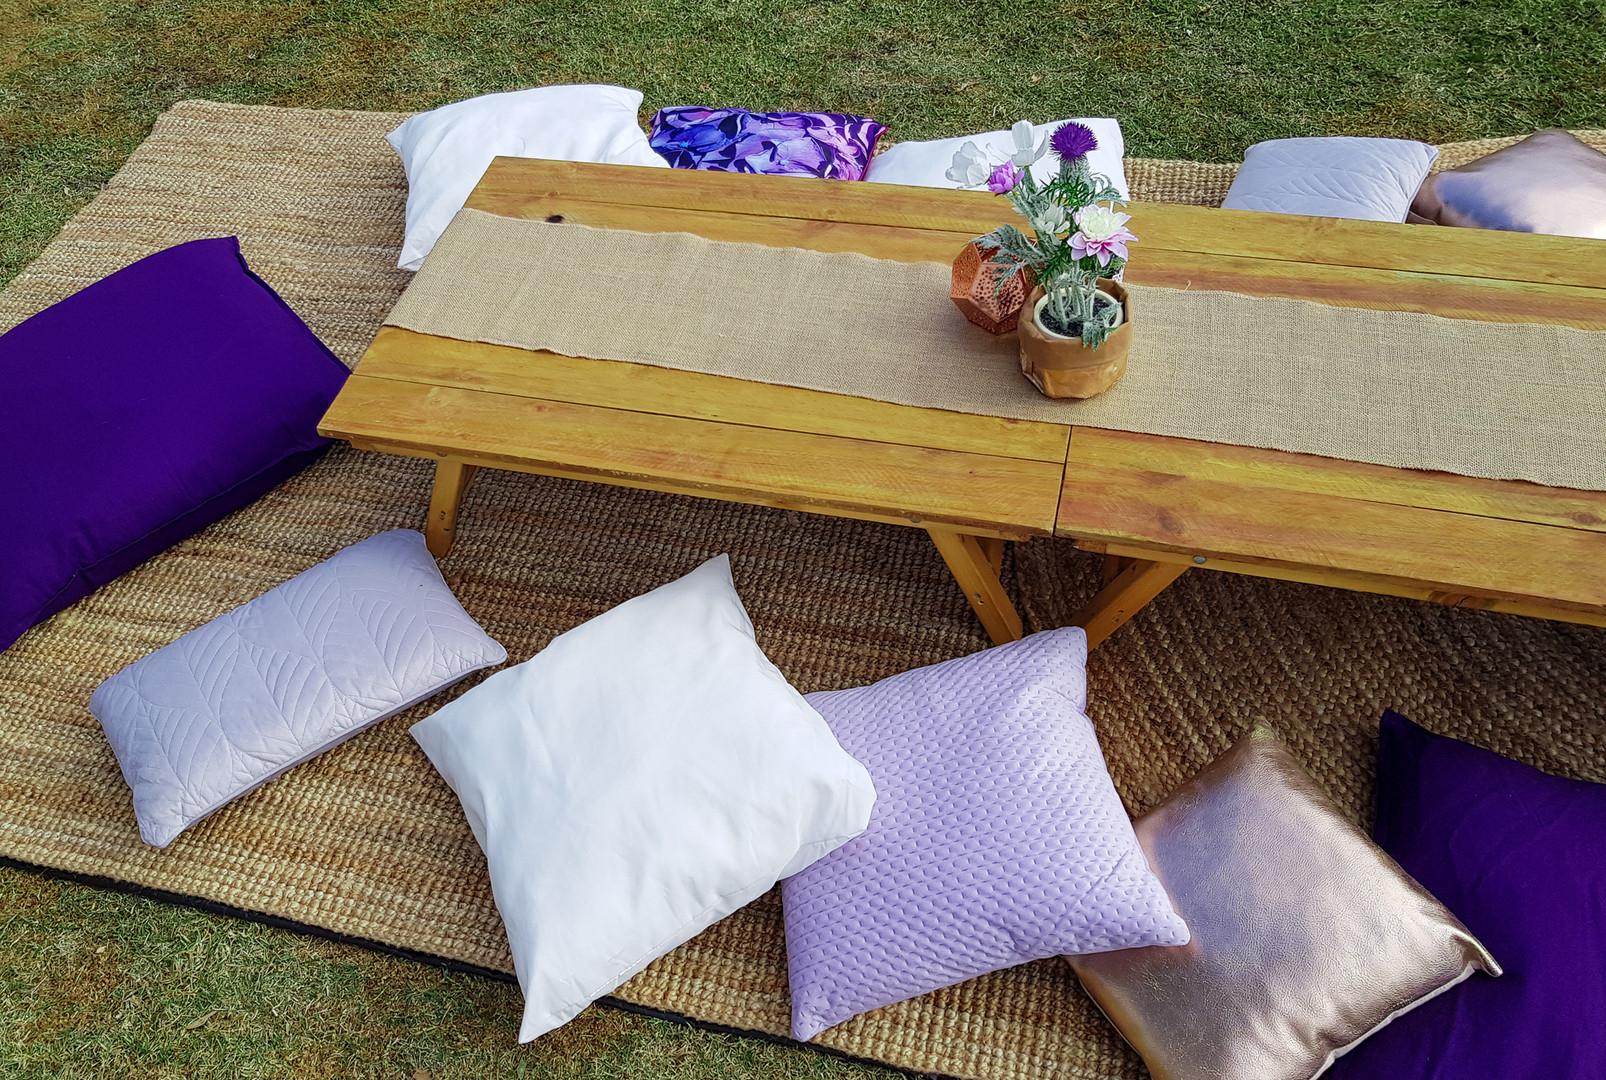 Purple Picnic setup